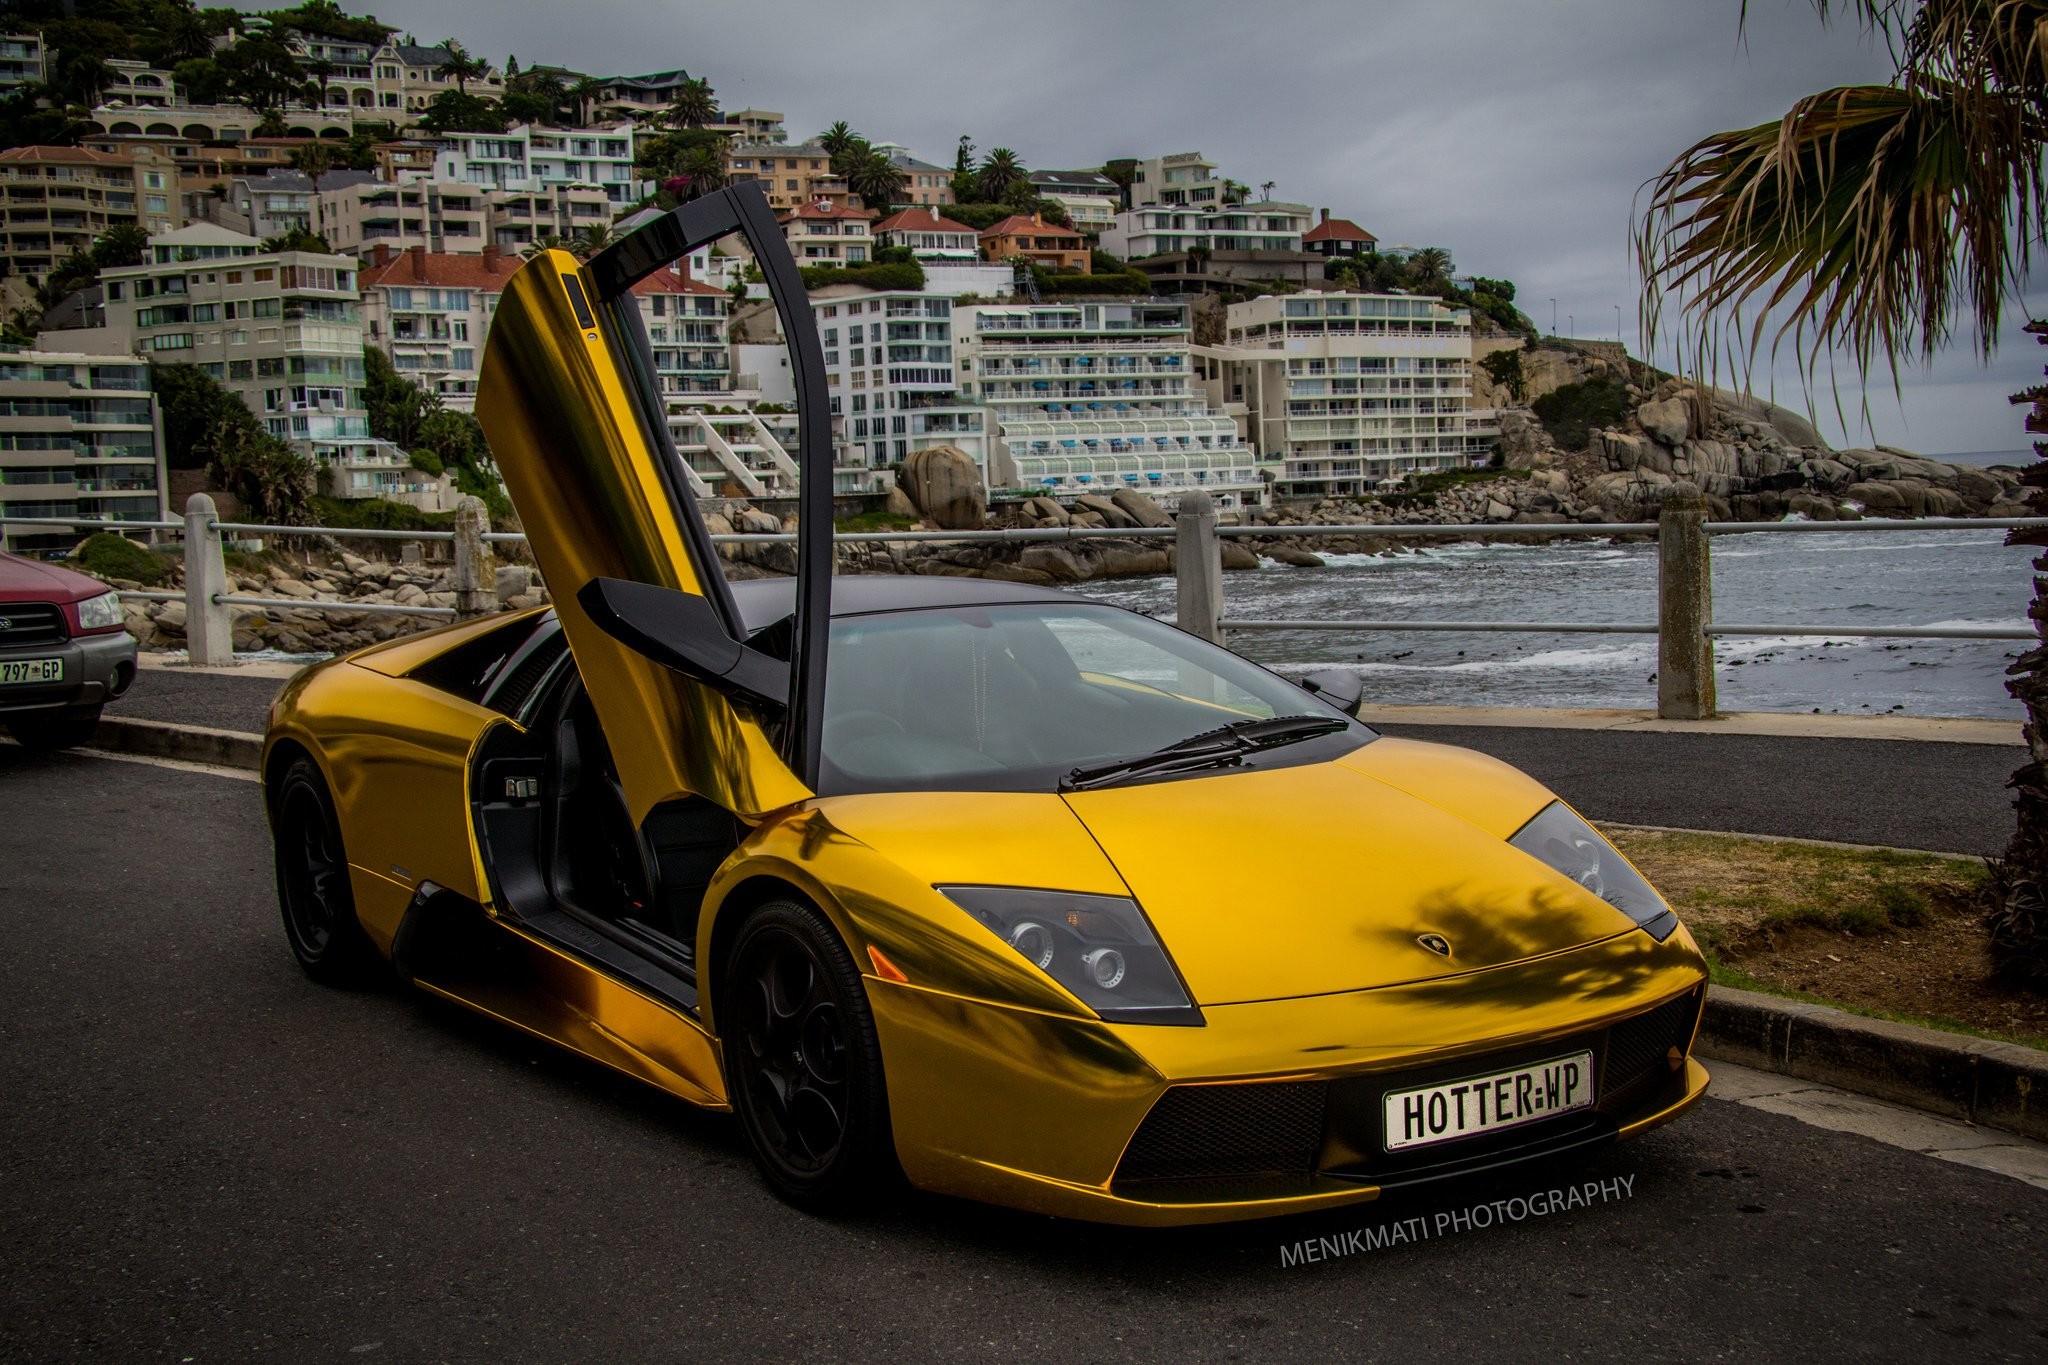 Res: 2048x1365, Lamborghini Murcielago gold chrome coupe Vinyl wrap cars supercars wallpaper       609403   WallpaperUP